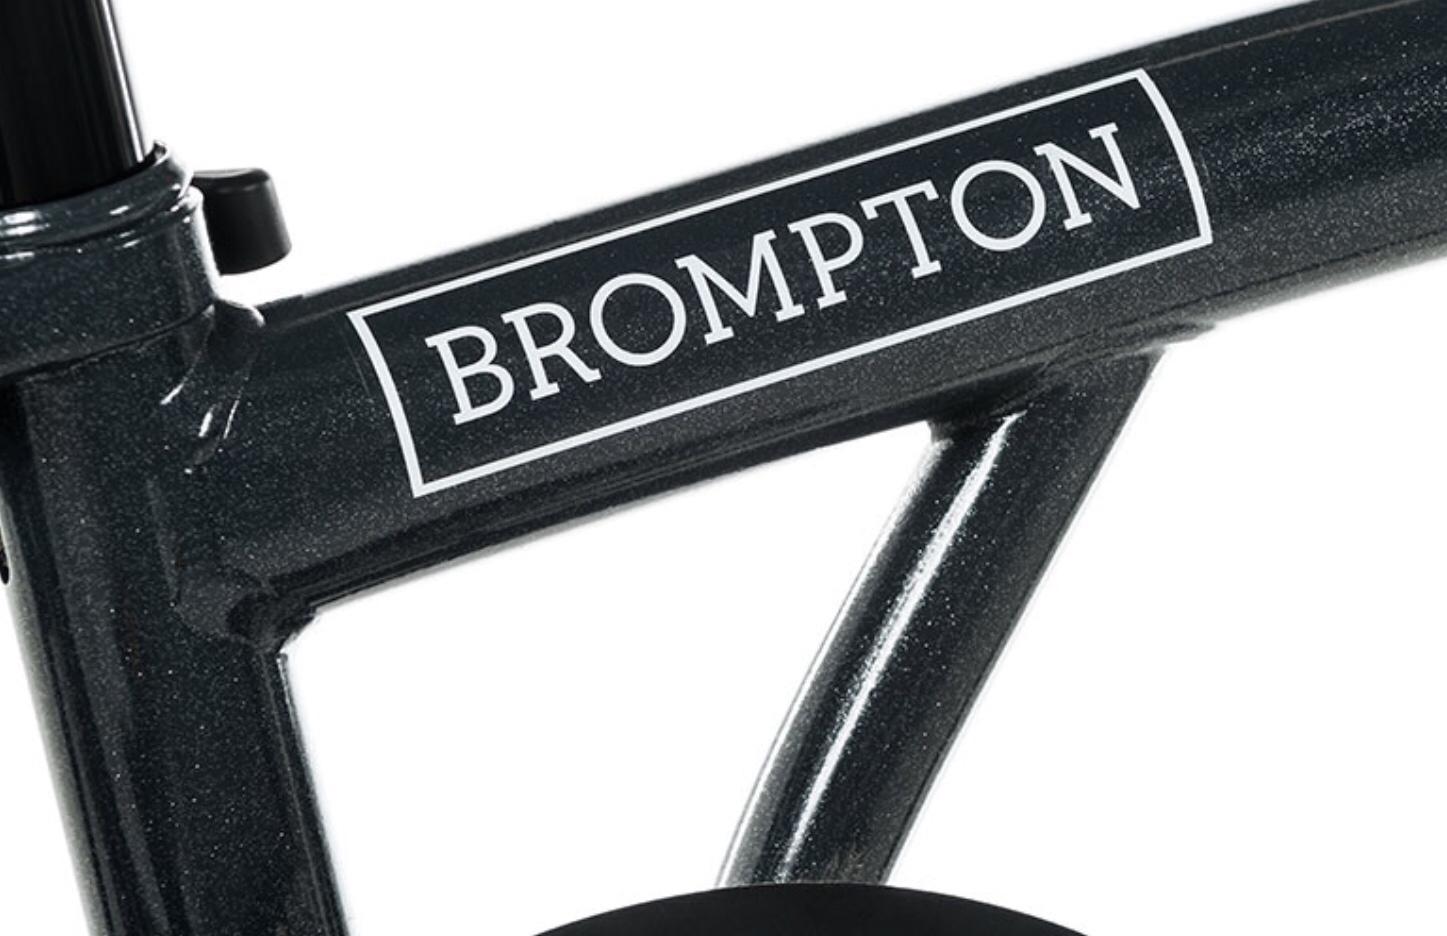 『BROMPTON × CHPT3』発売_d0197762_18012251.jpg